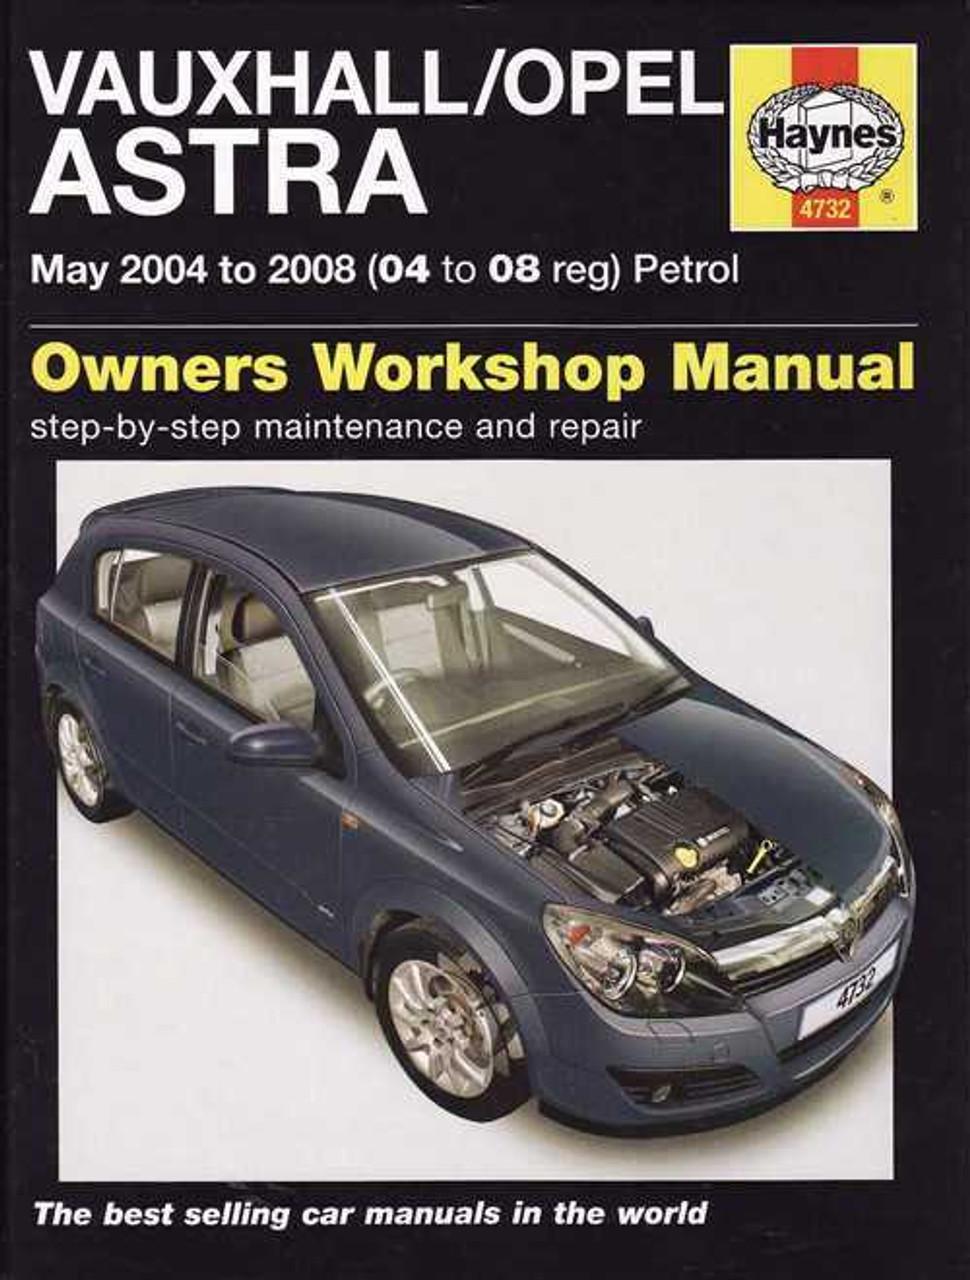 Astra 2004 2008 petrol workshop manual holden astra 2004 2008 petrol workshop manual fandeluxe Choice Image